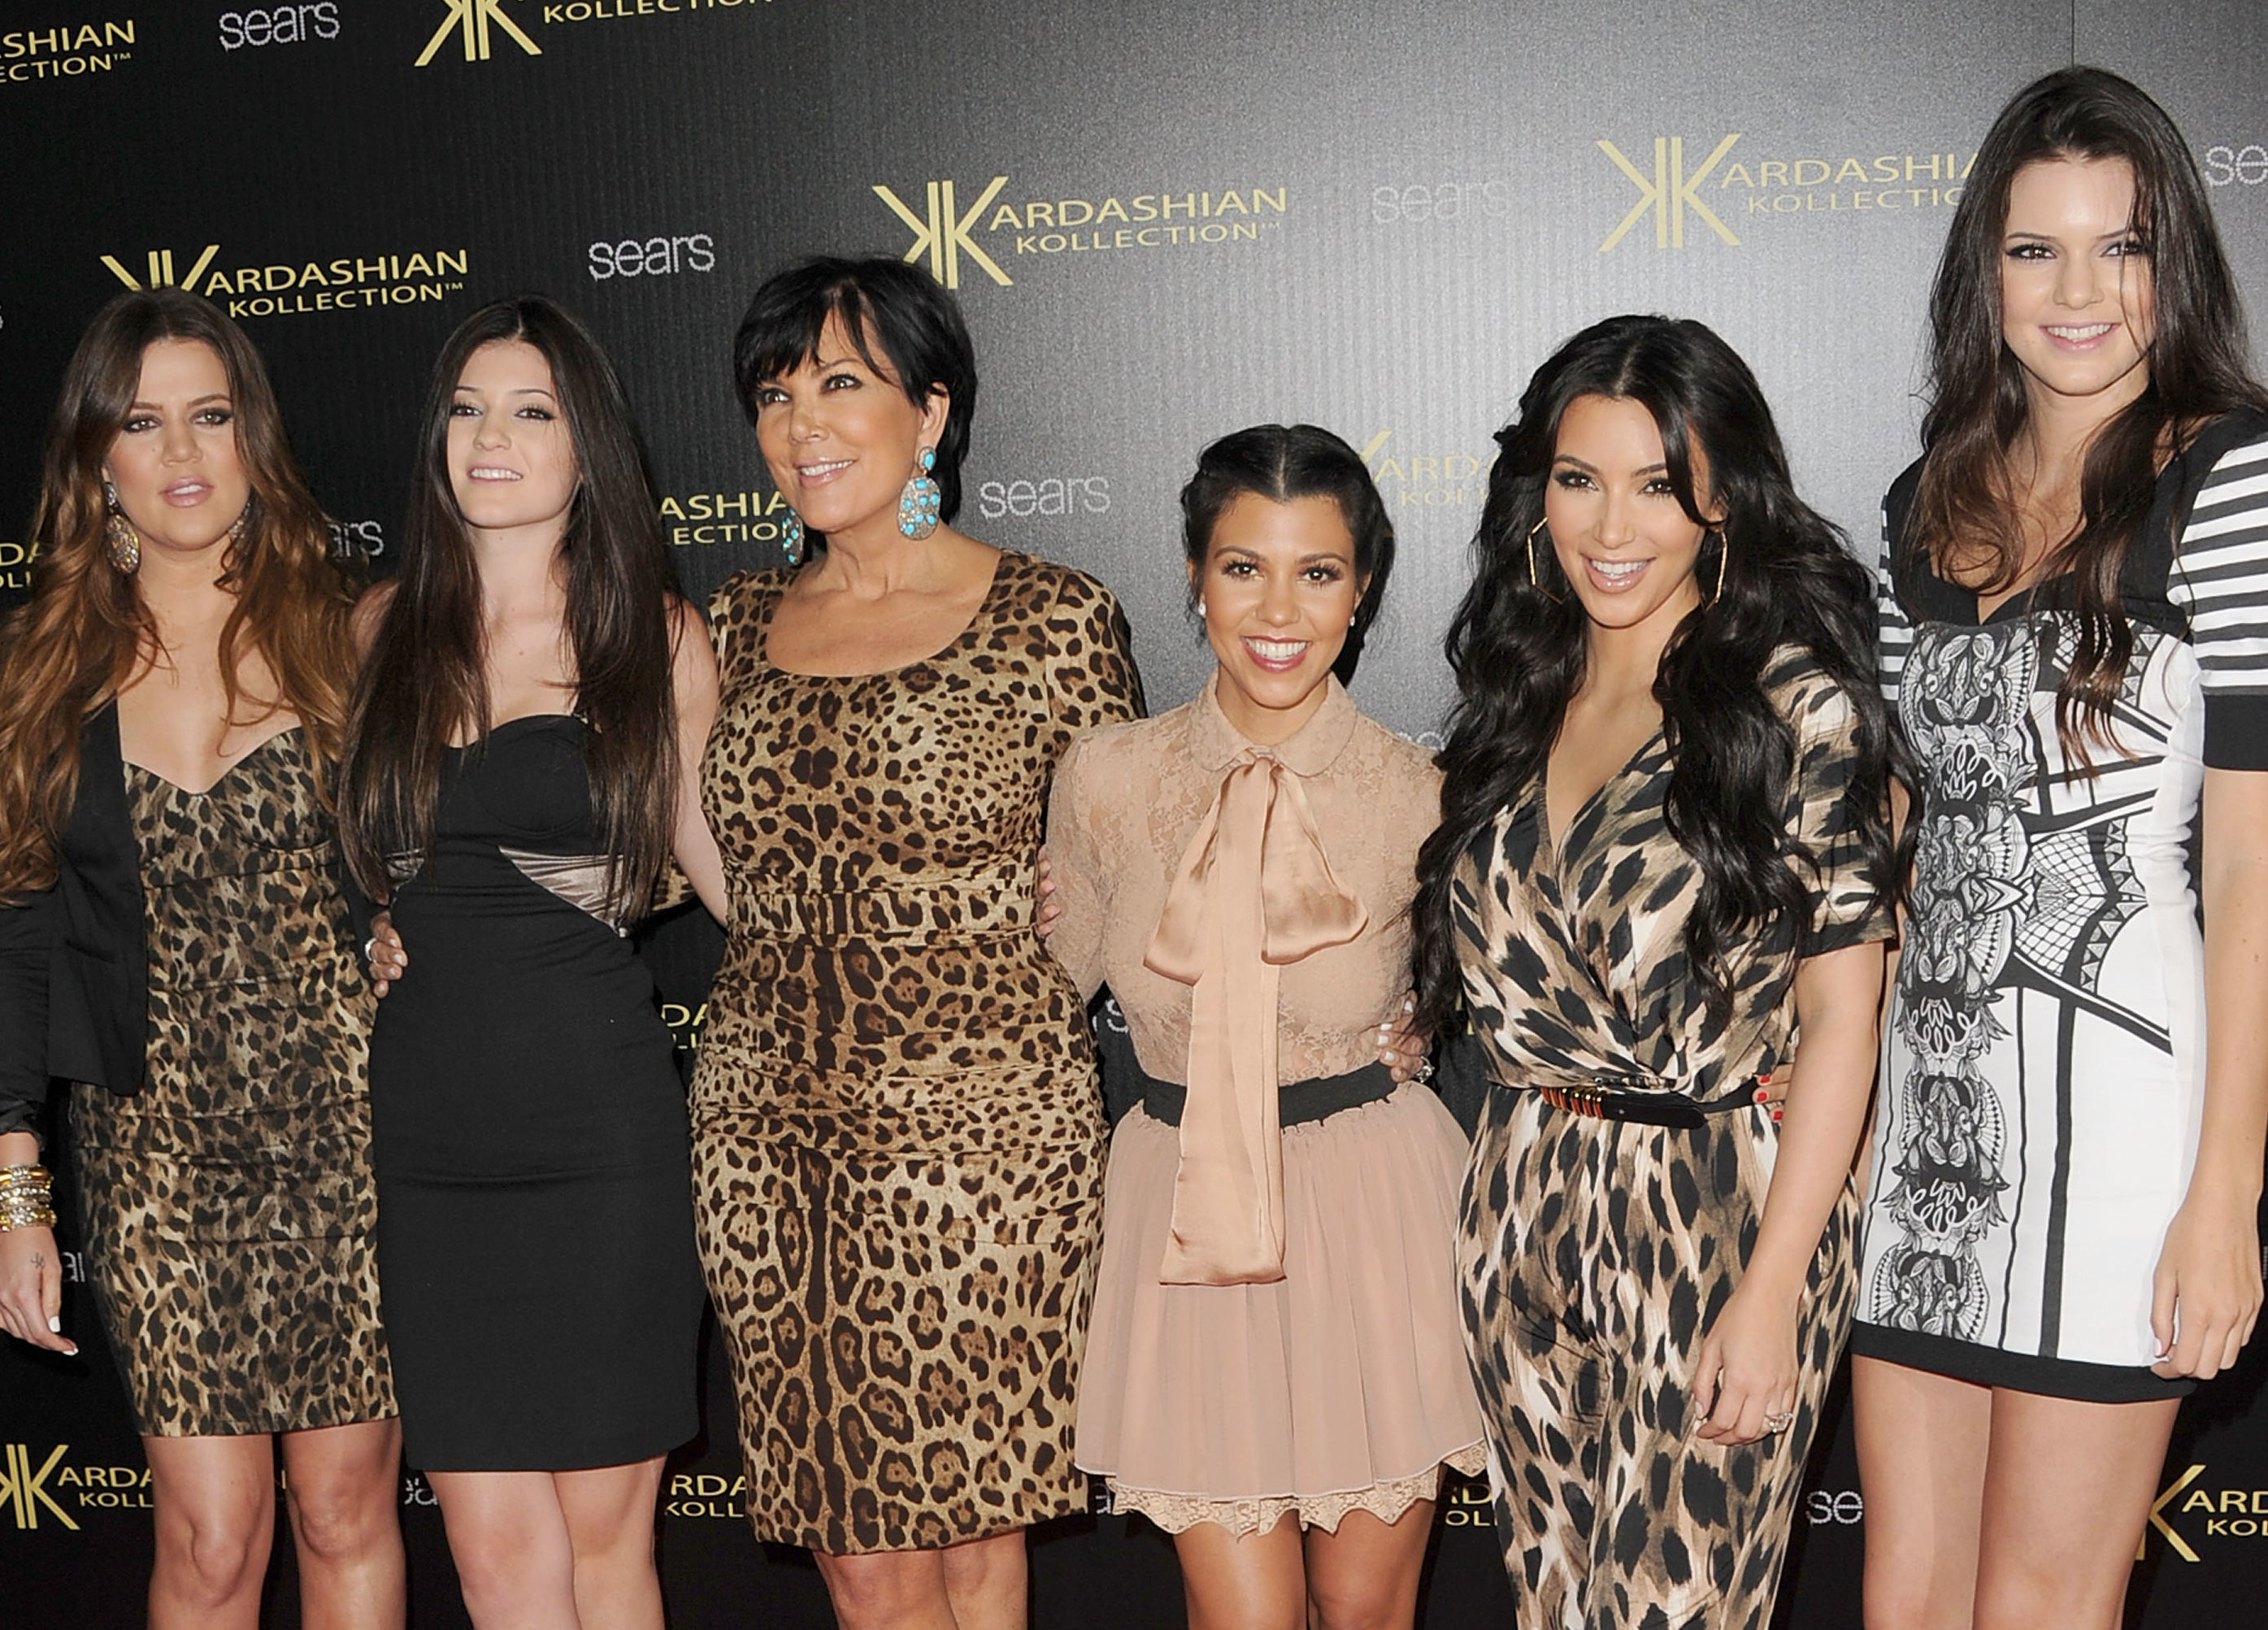 All the Kardashian women at an event wearing animal-print dresses